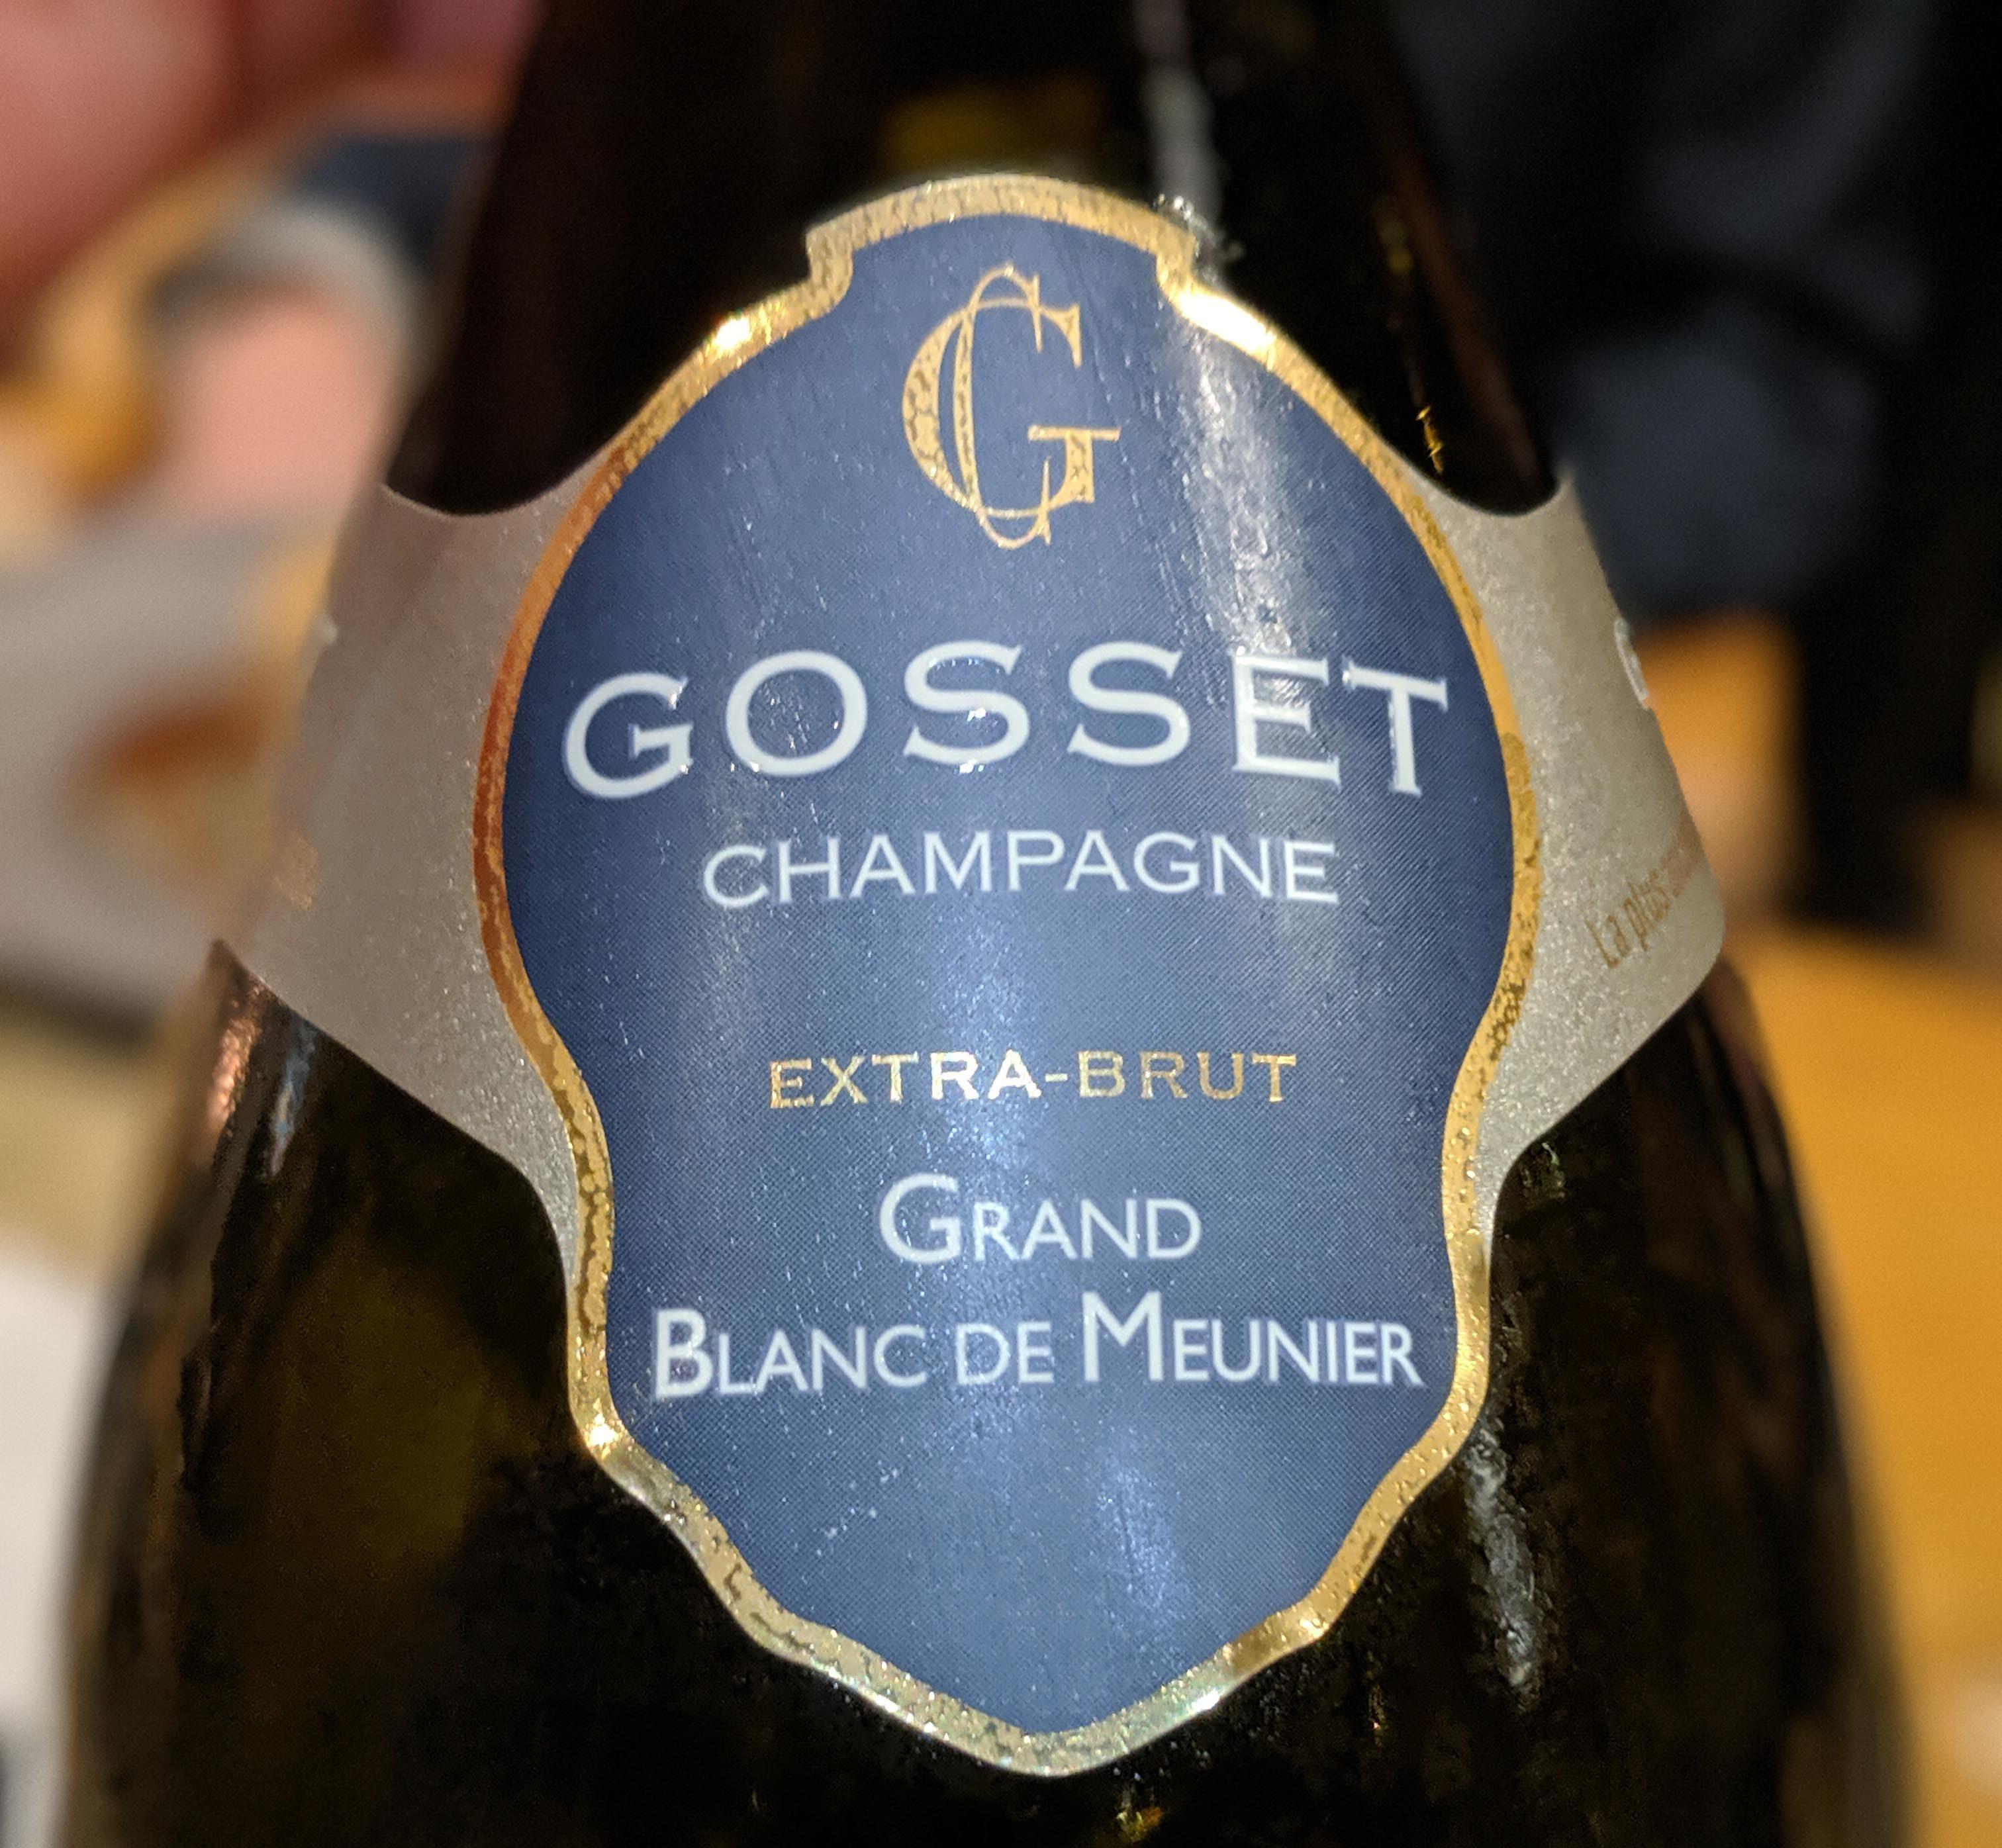 Grand Blanc de Meunier Gosset Champagner